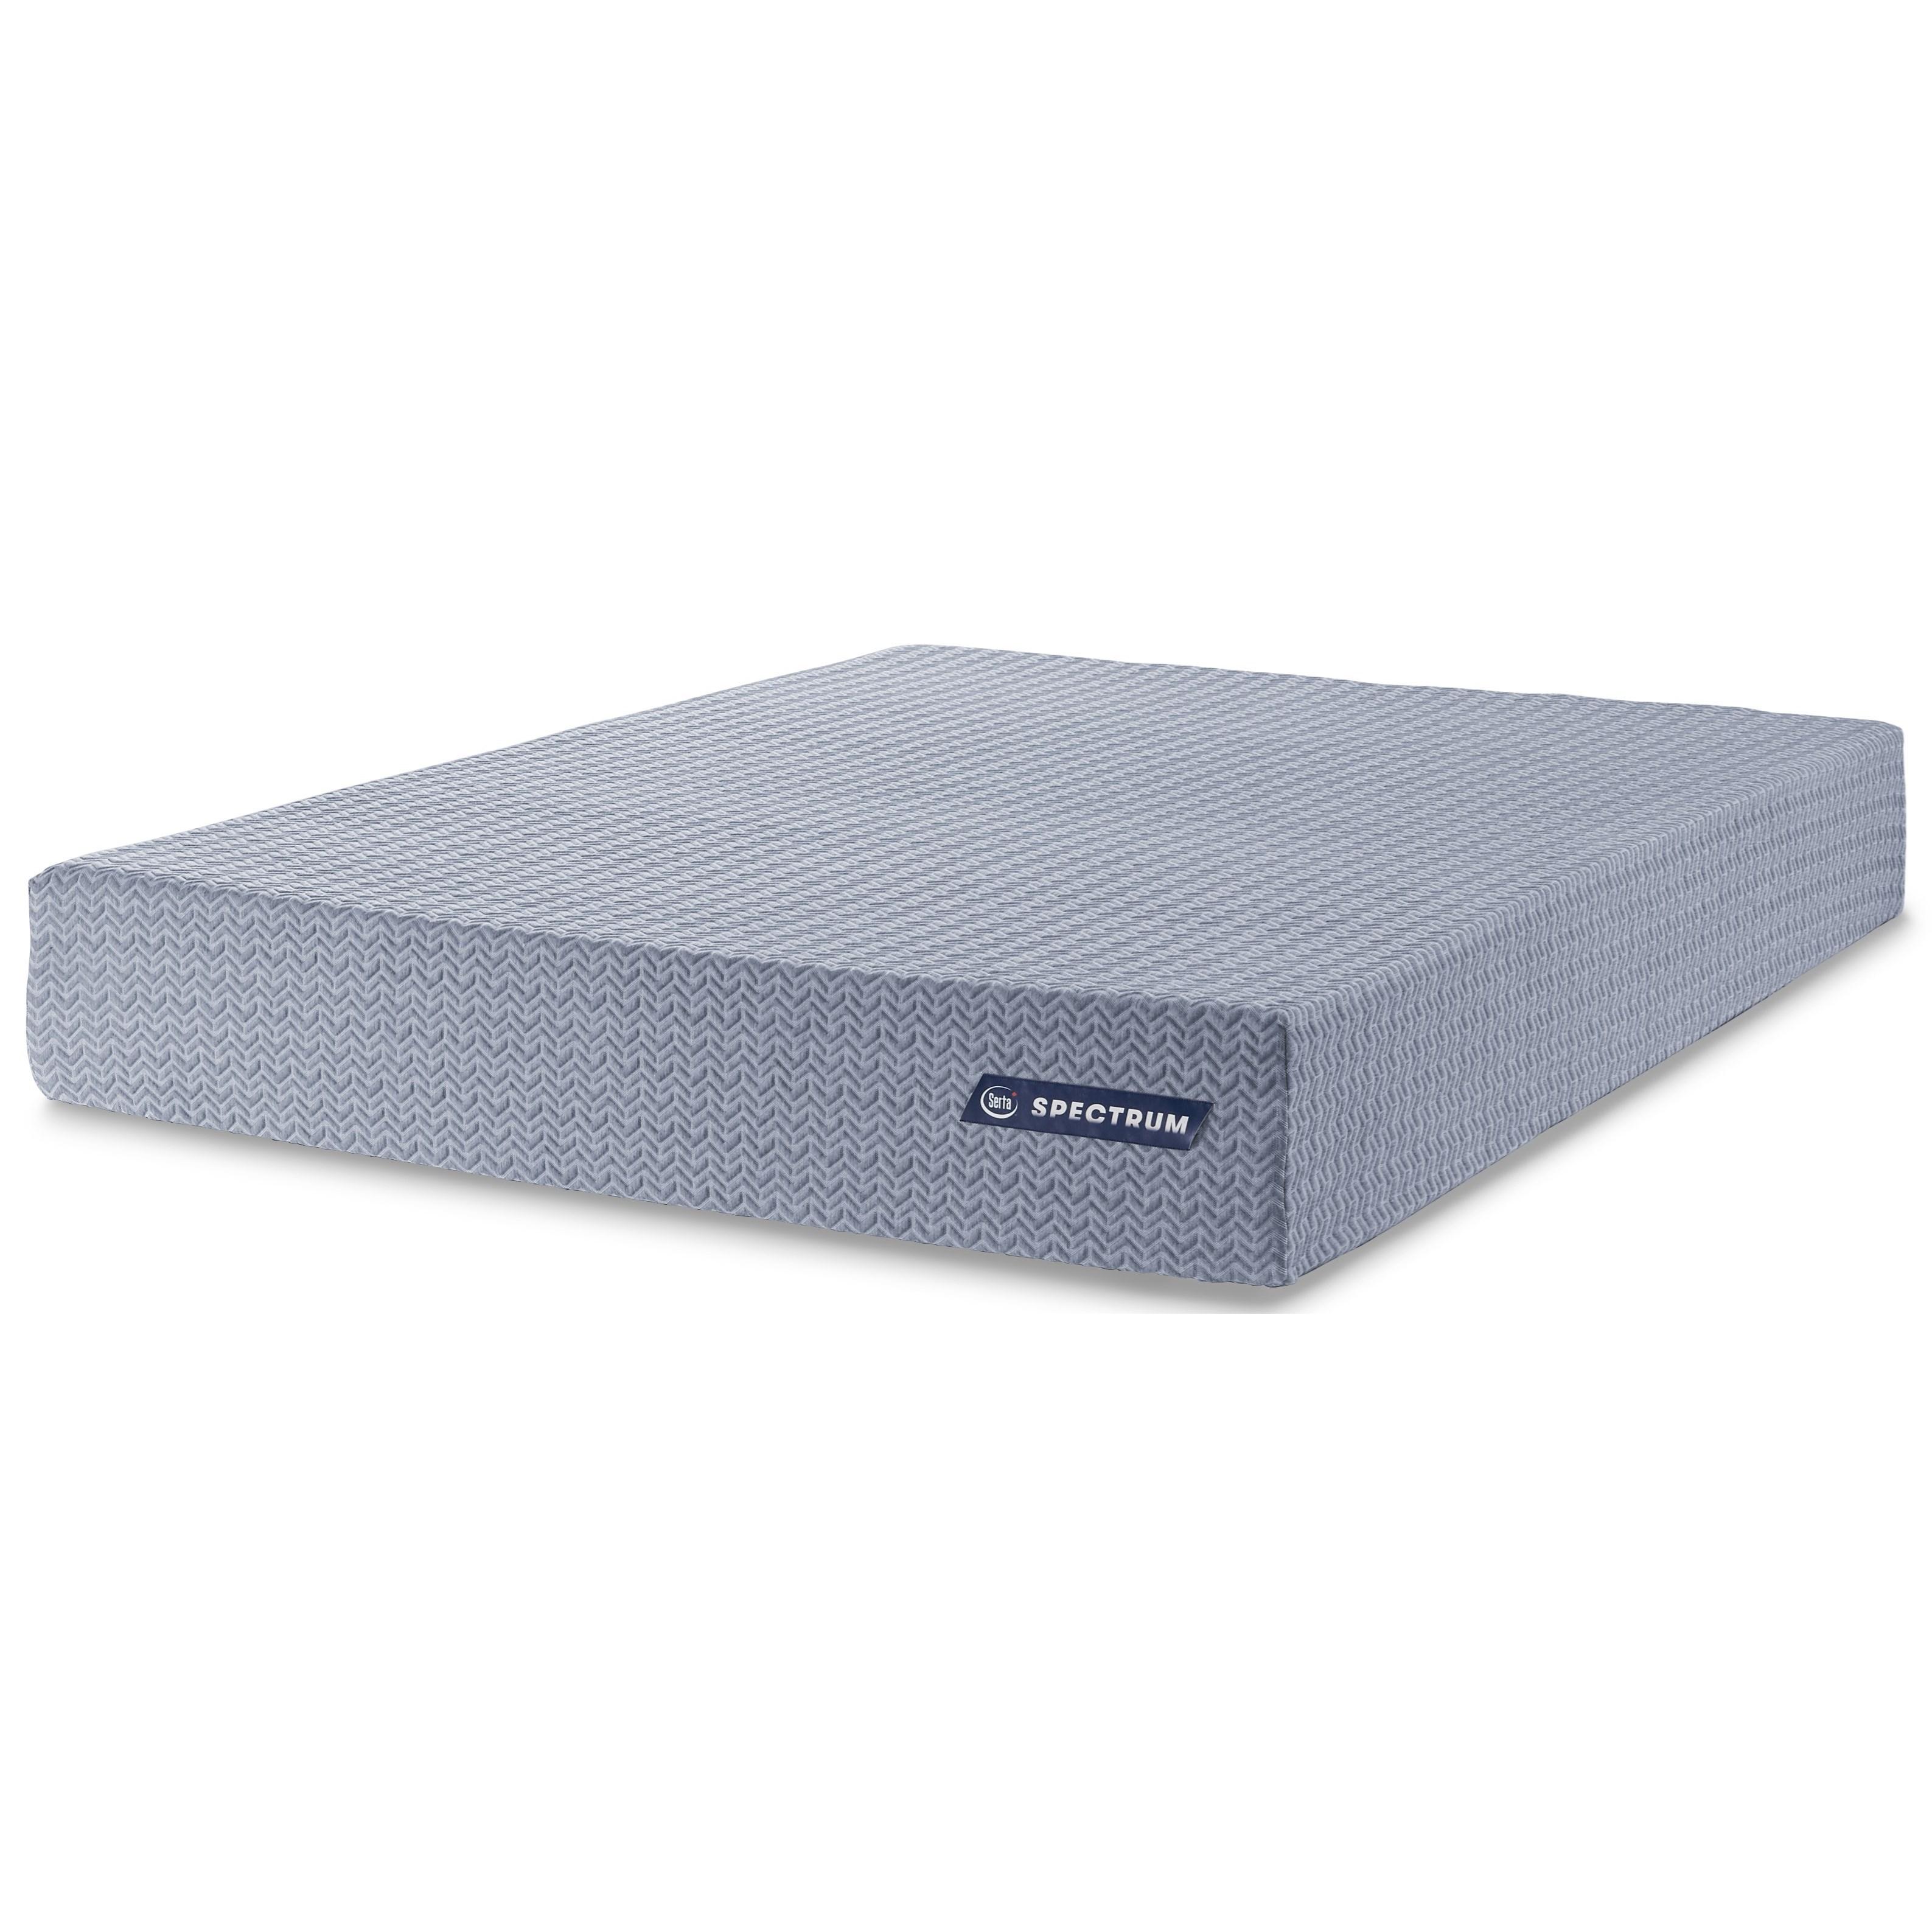 "Spectrum 10 Queen 10"" Plush Memory Foam Mattress by Serta Canada at Stoney Creek Furniture"